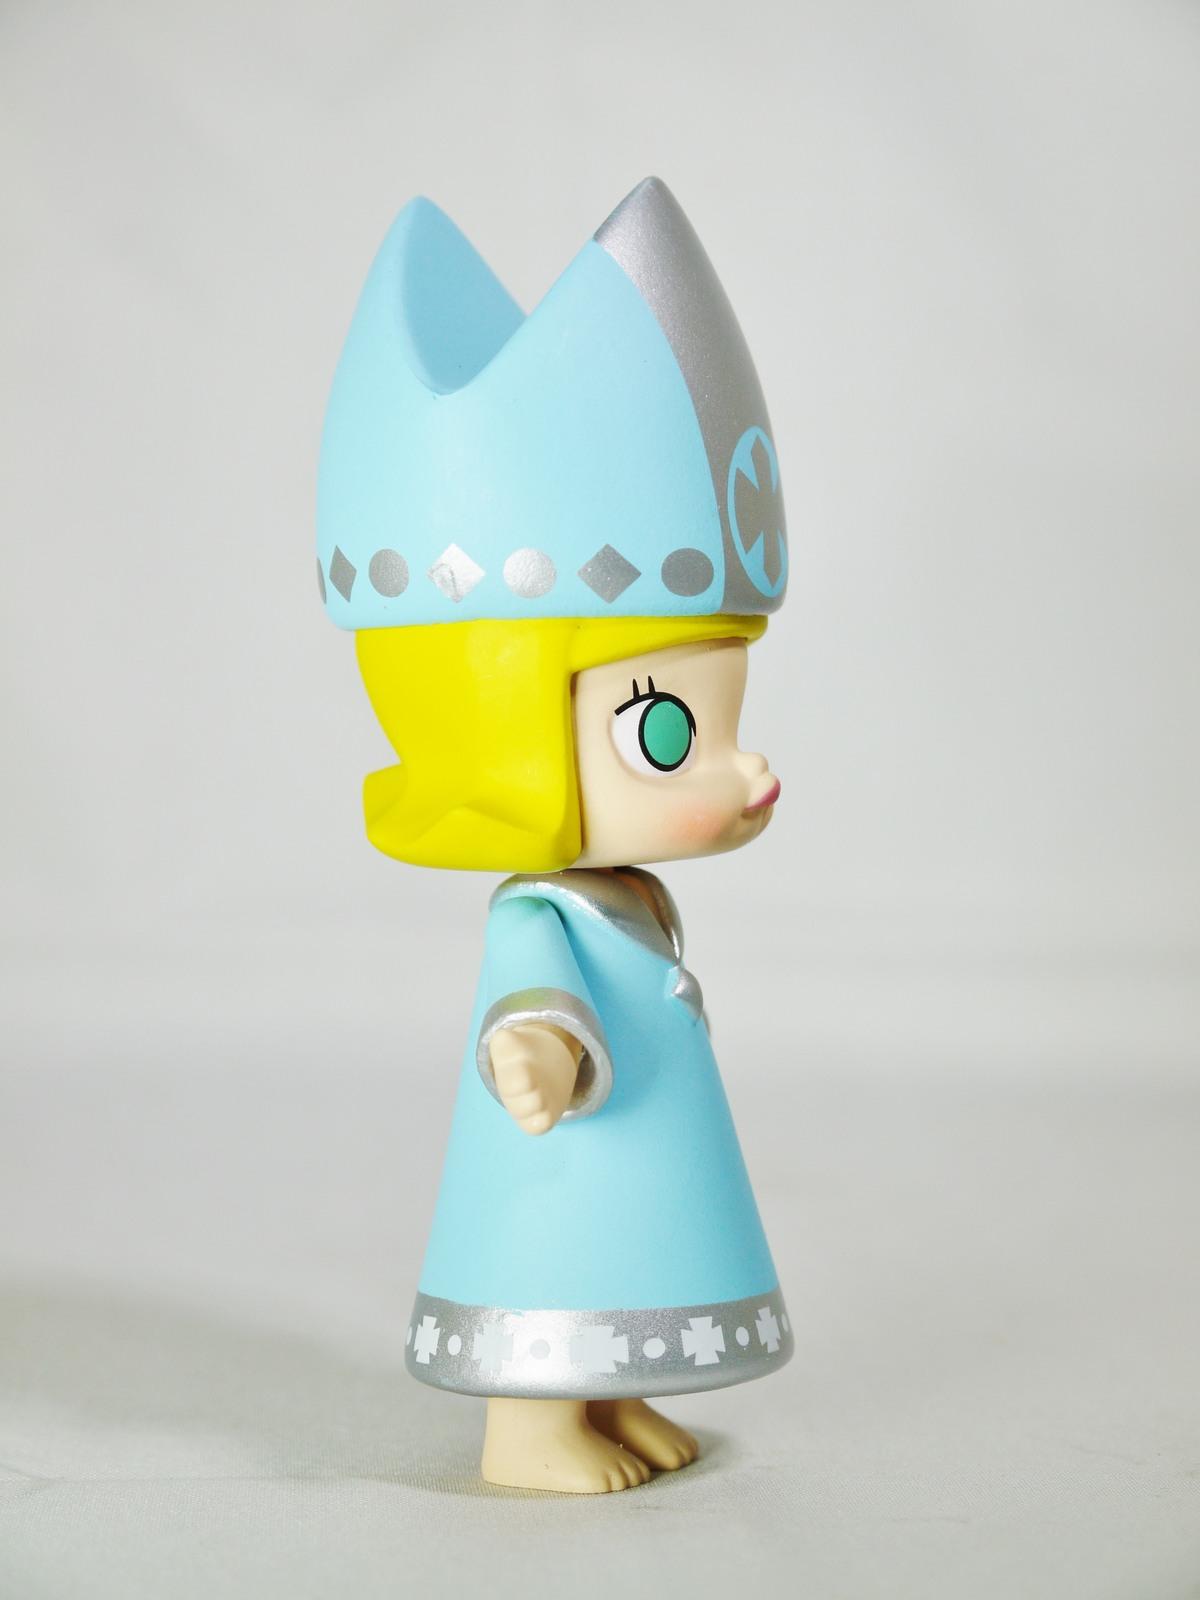 POP MART Kennyswork BLOCK Little Molly Chess Club Chessmate BISHOP BLUE